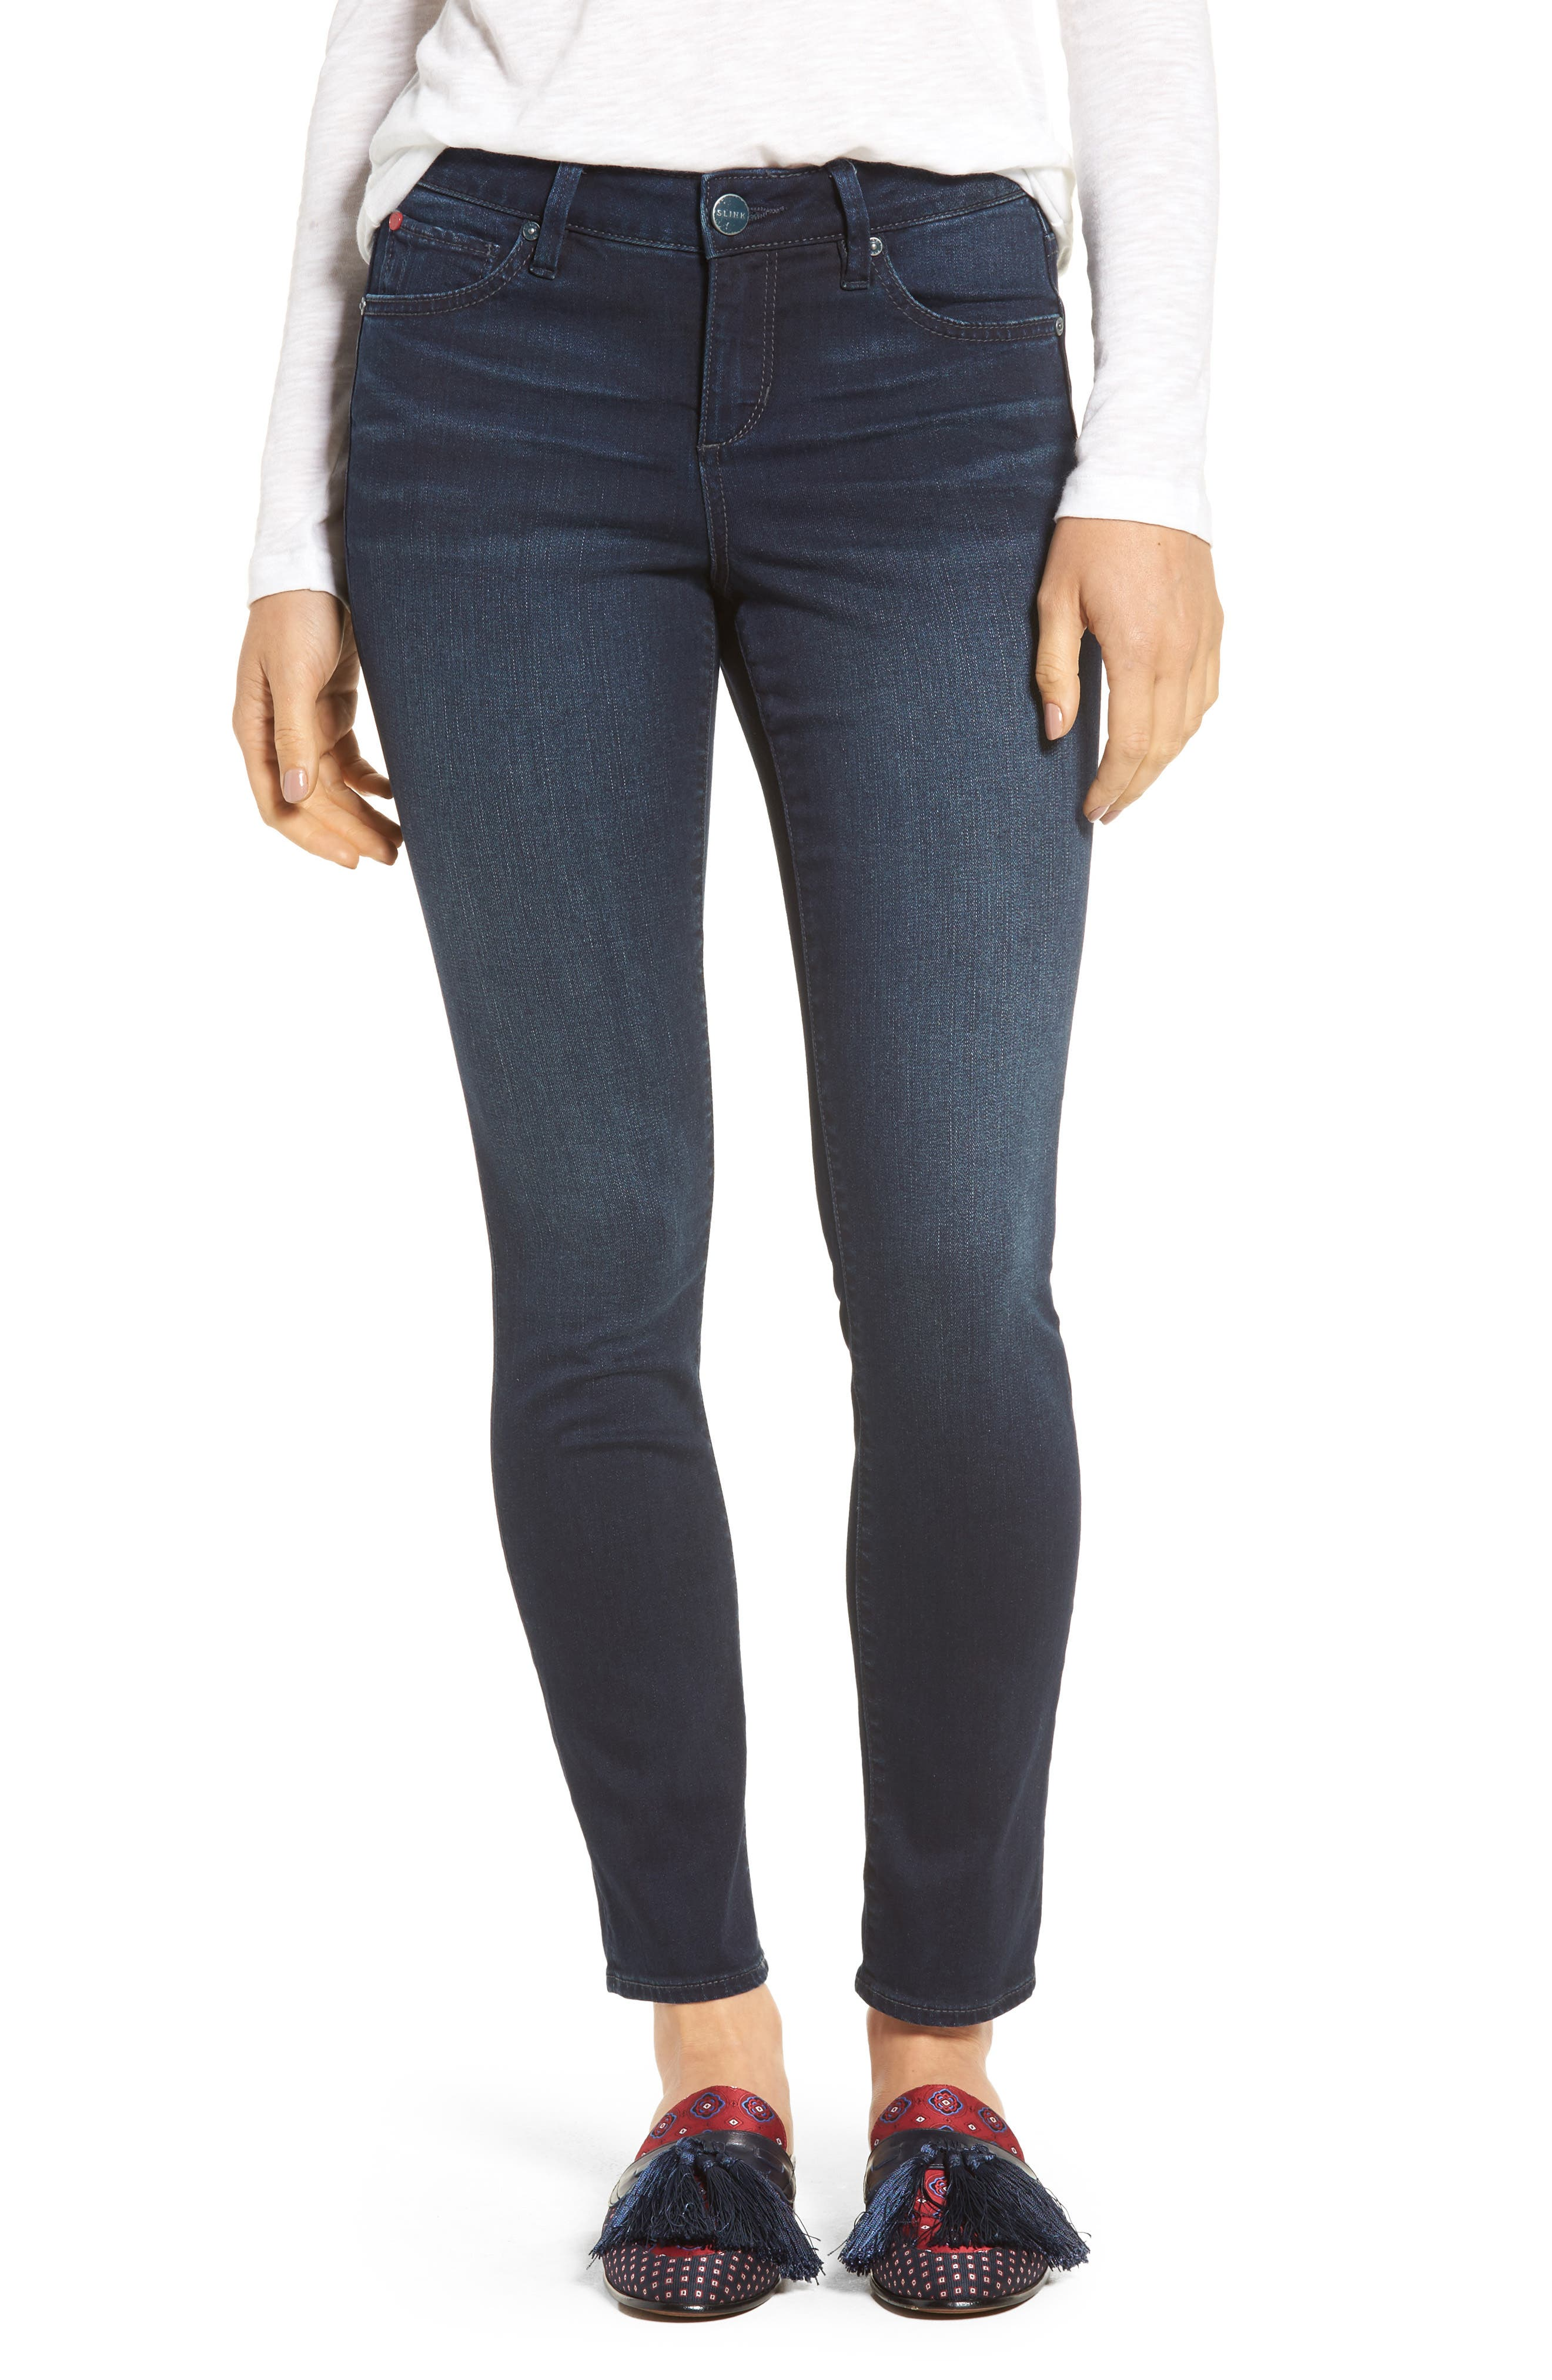 SLINK Jeans Skinny Jeans (Piper)